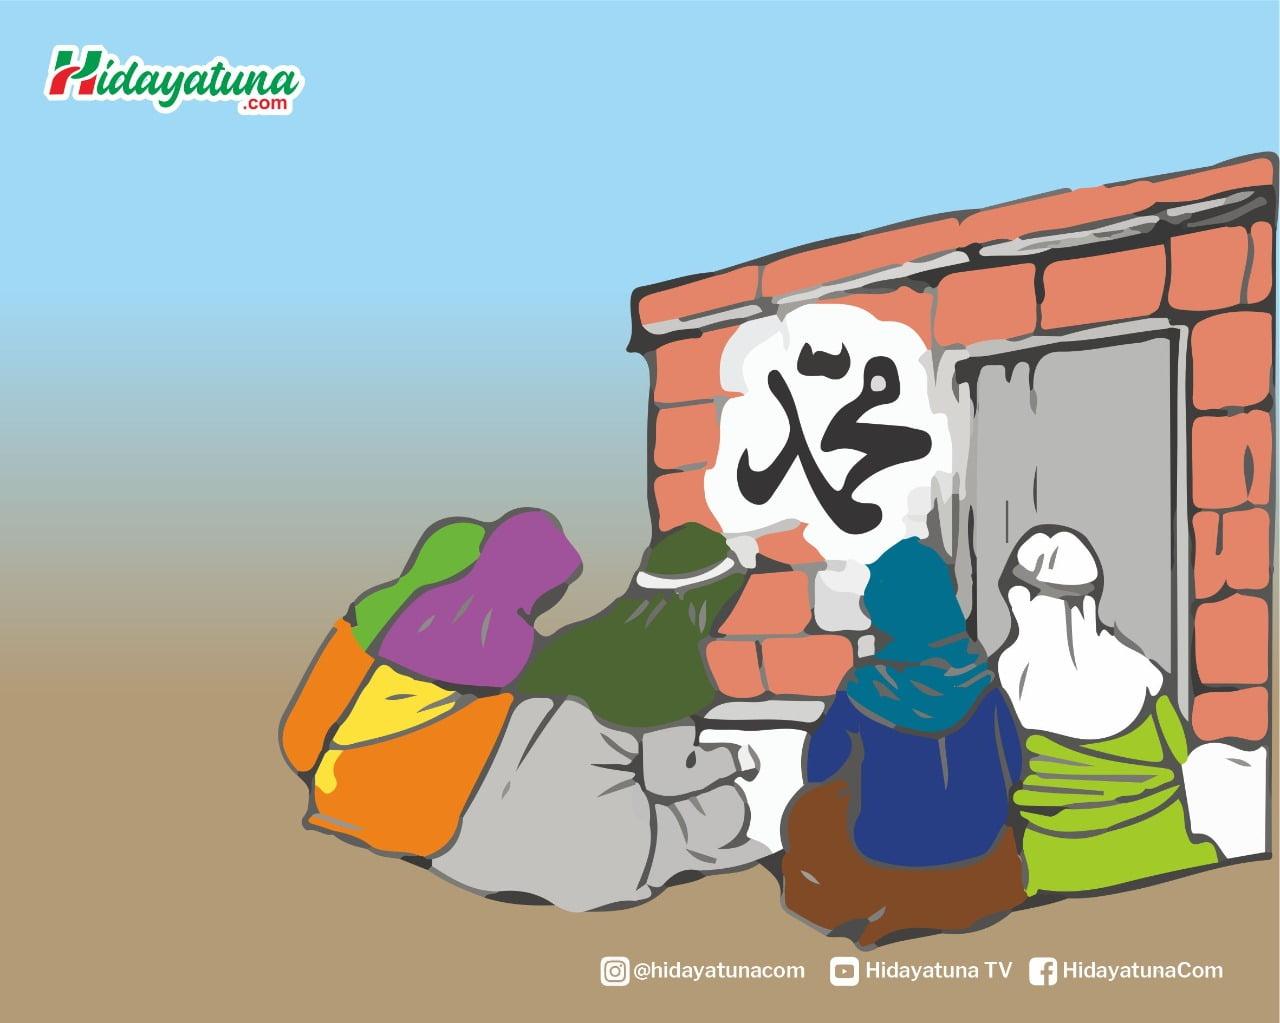 Dua Sayyid keturunan Rasulullah (Ilustrasi/Hidayatuna)